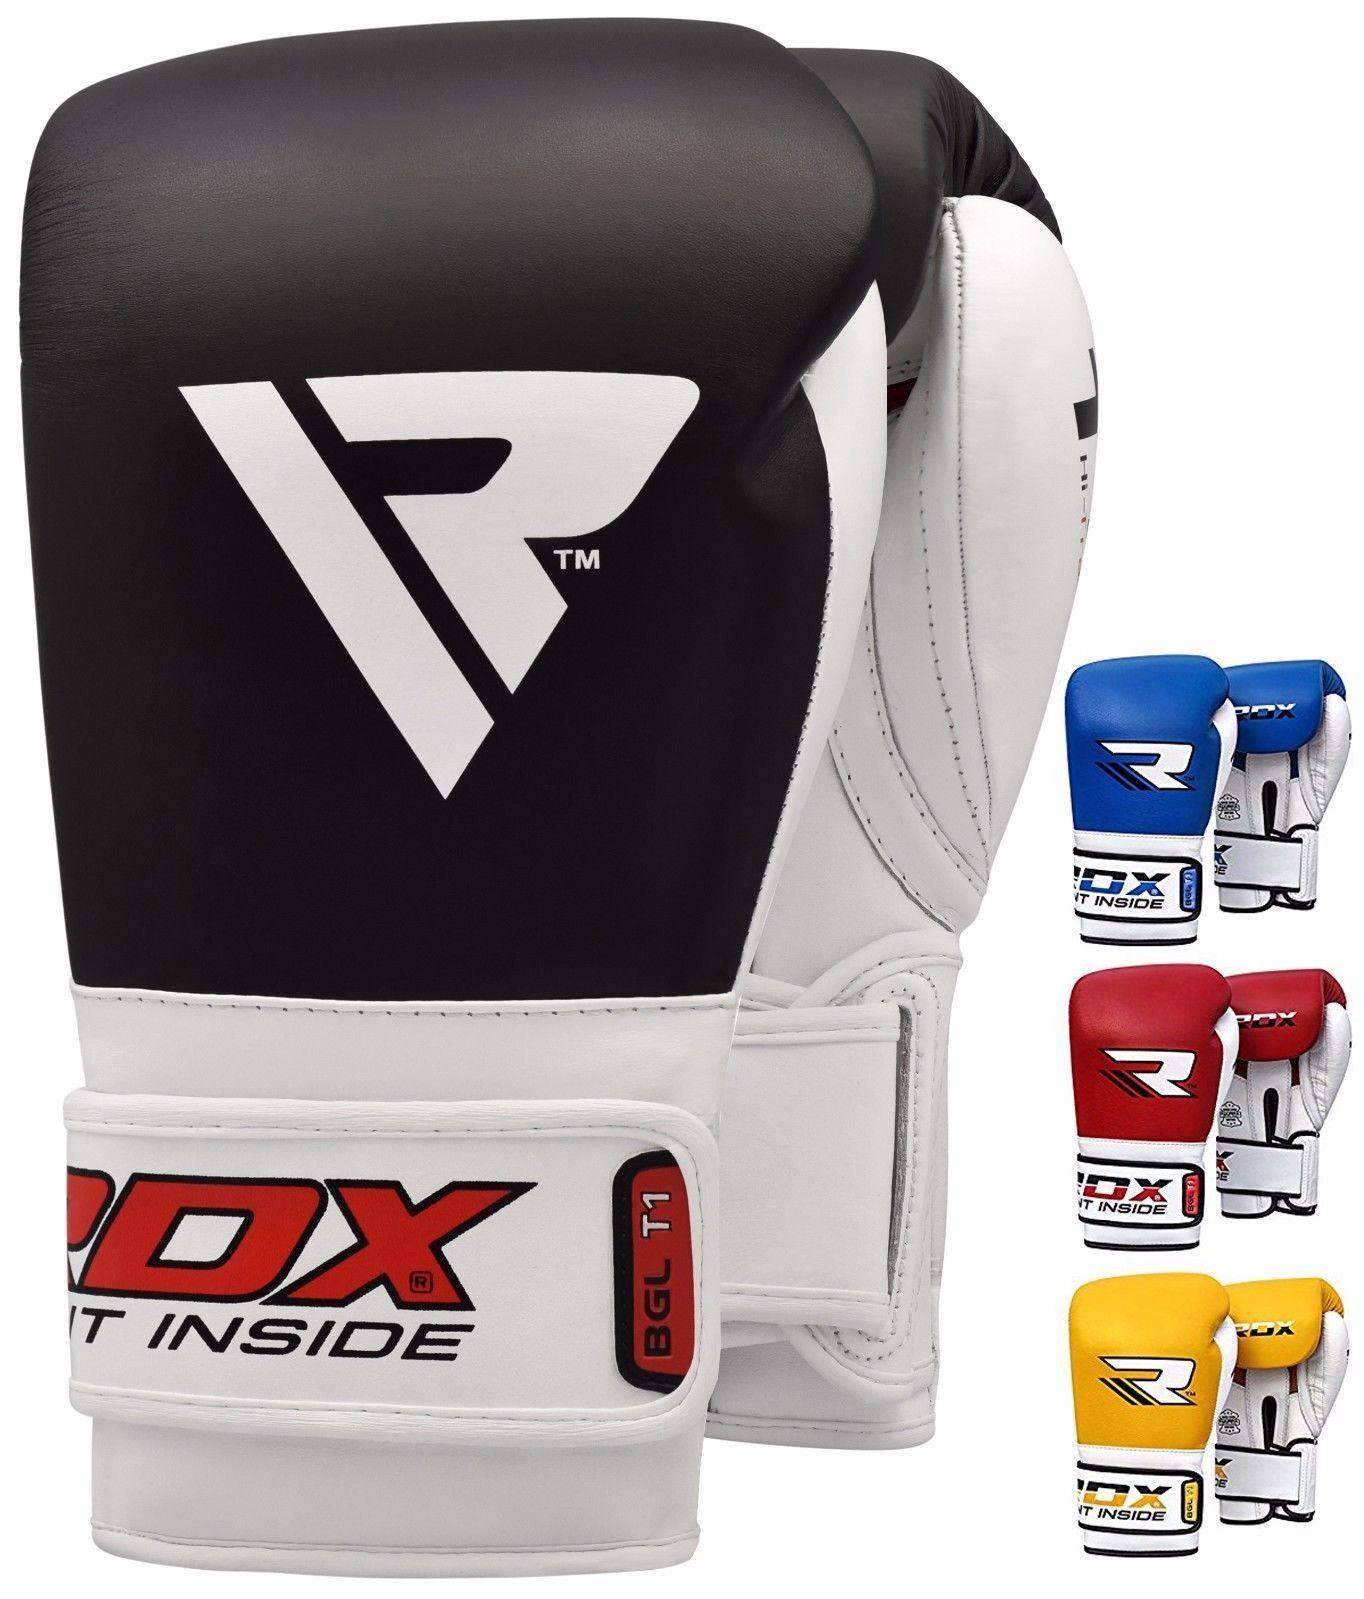 RDX thai Leder Gel Boxing Gloves Fight,Punch Bag MMA Muay thai RDX Grappling Pad UFC UR 103c38